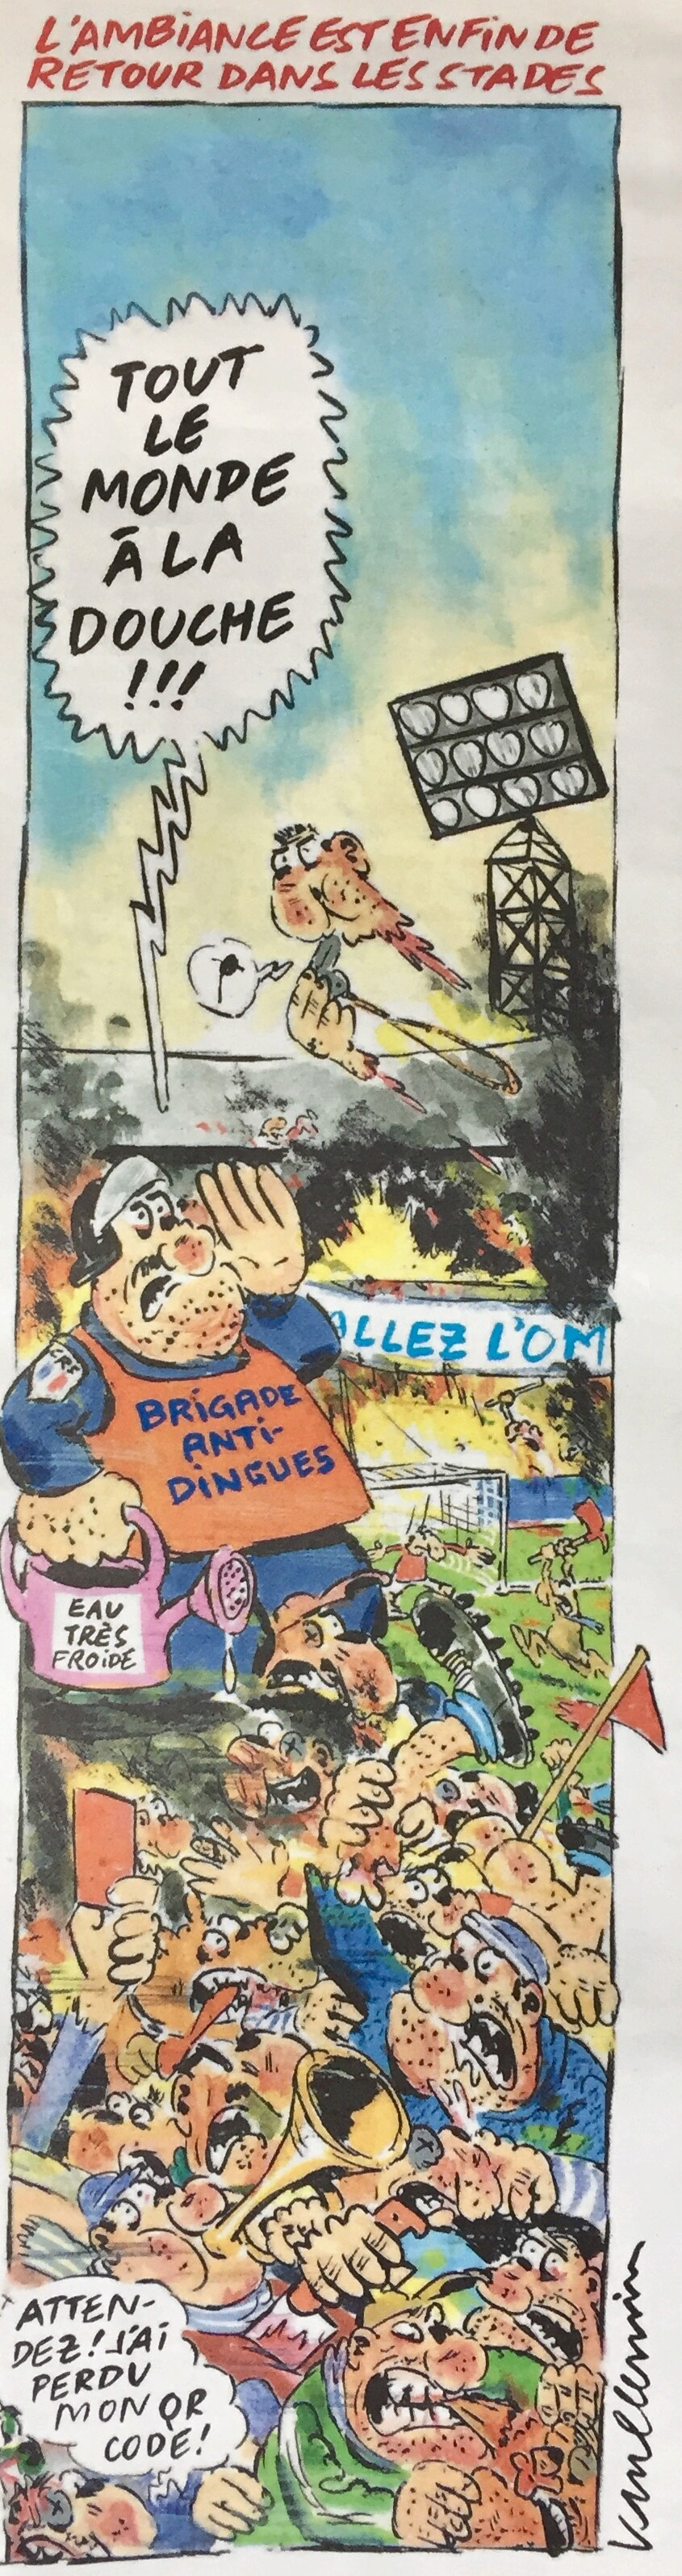 Dessins de presse  - Page 9 Df045410